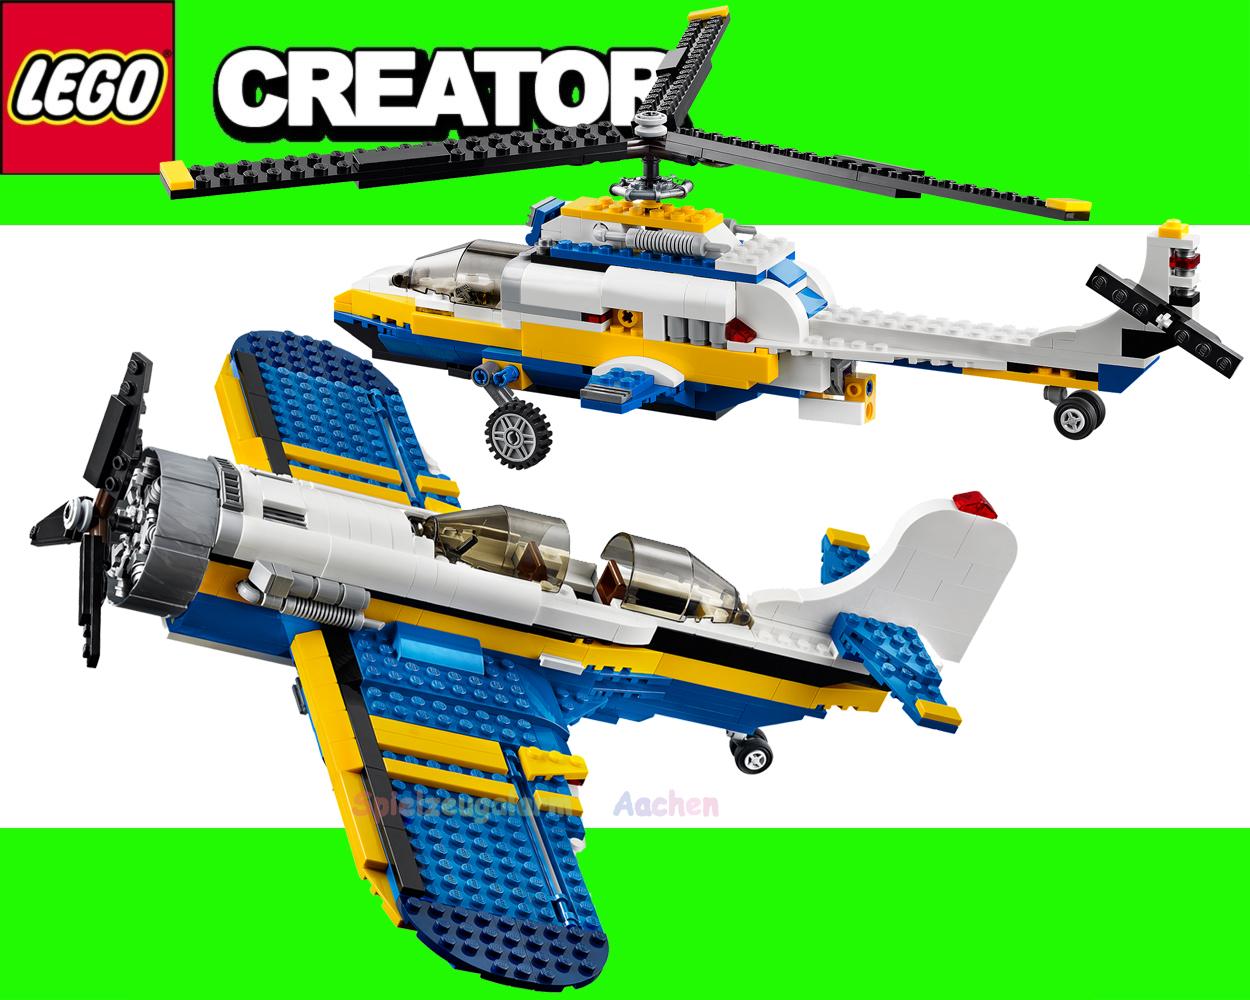 Lego creator 31011 propeller plane aviation adventures l - Avion de chasse en lego ...